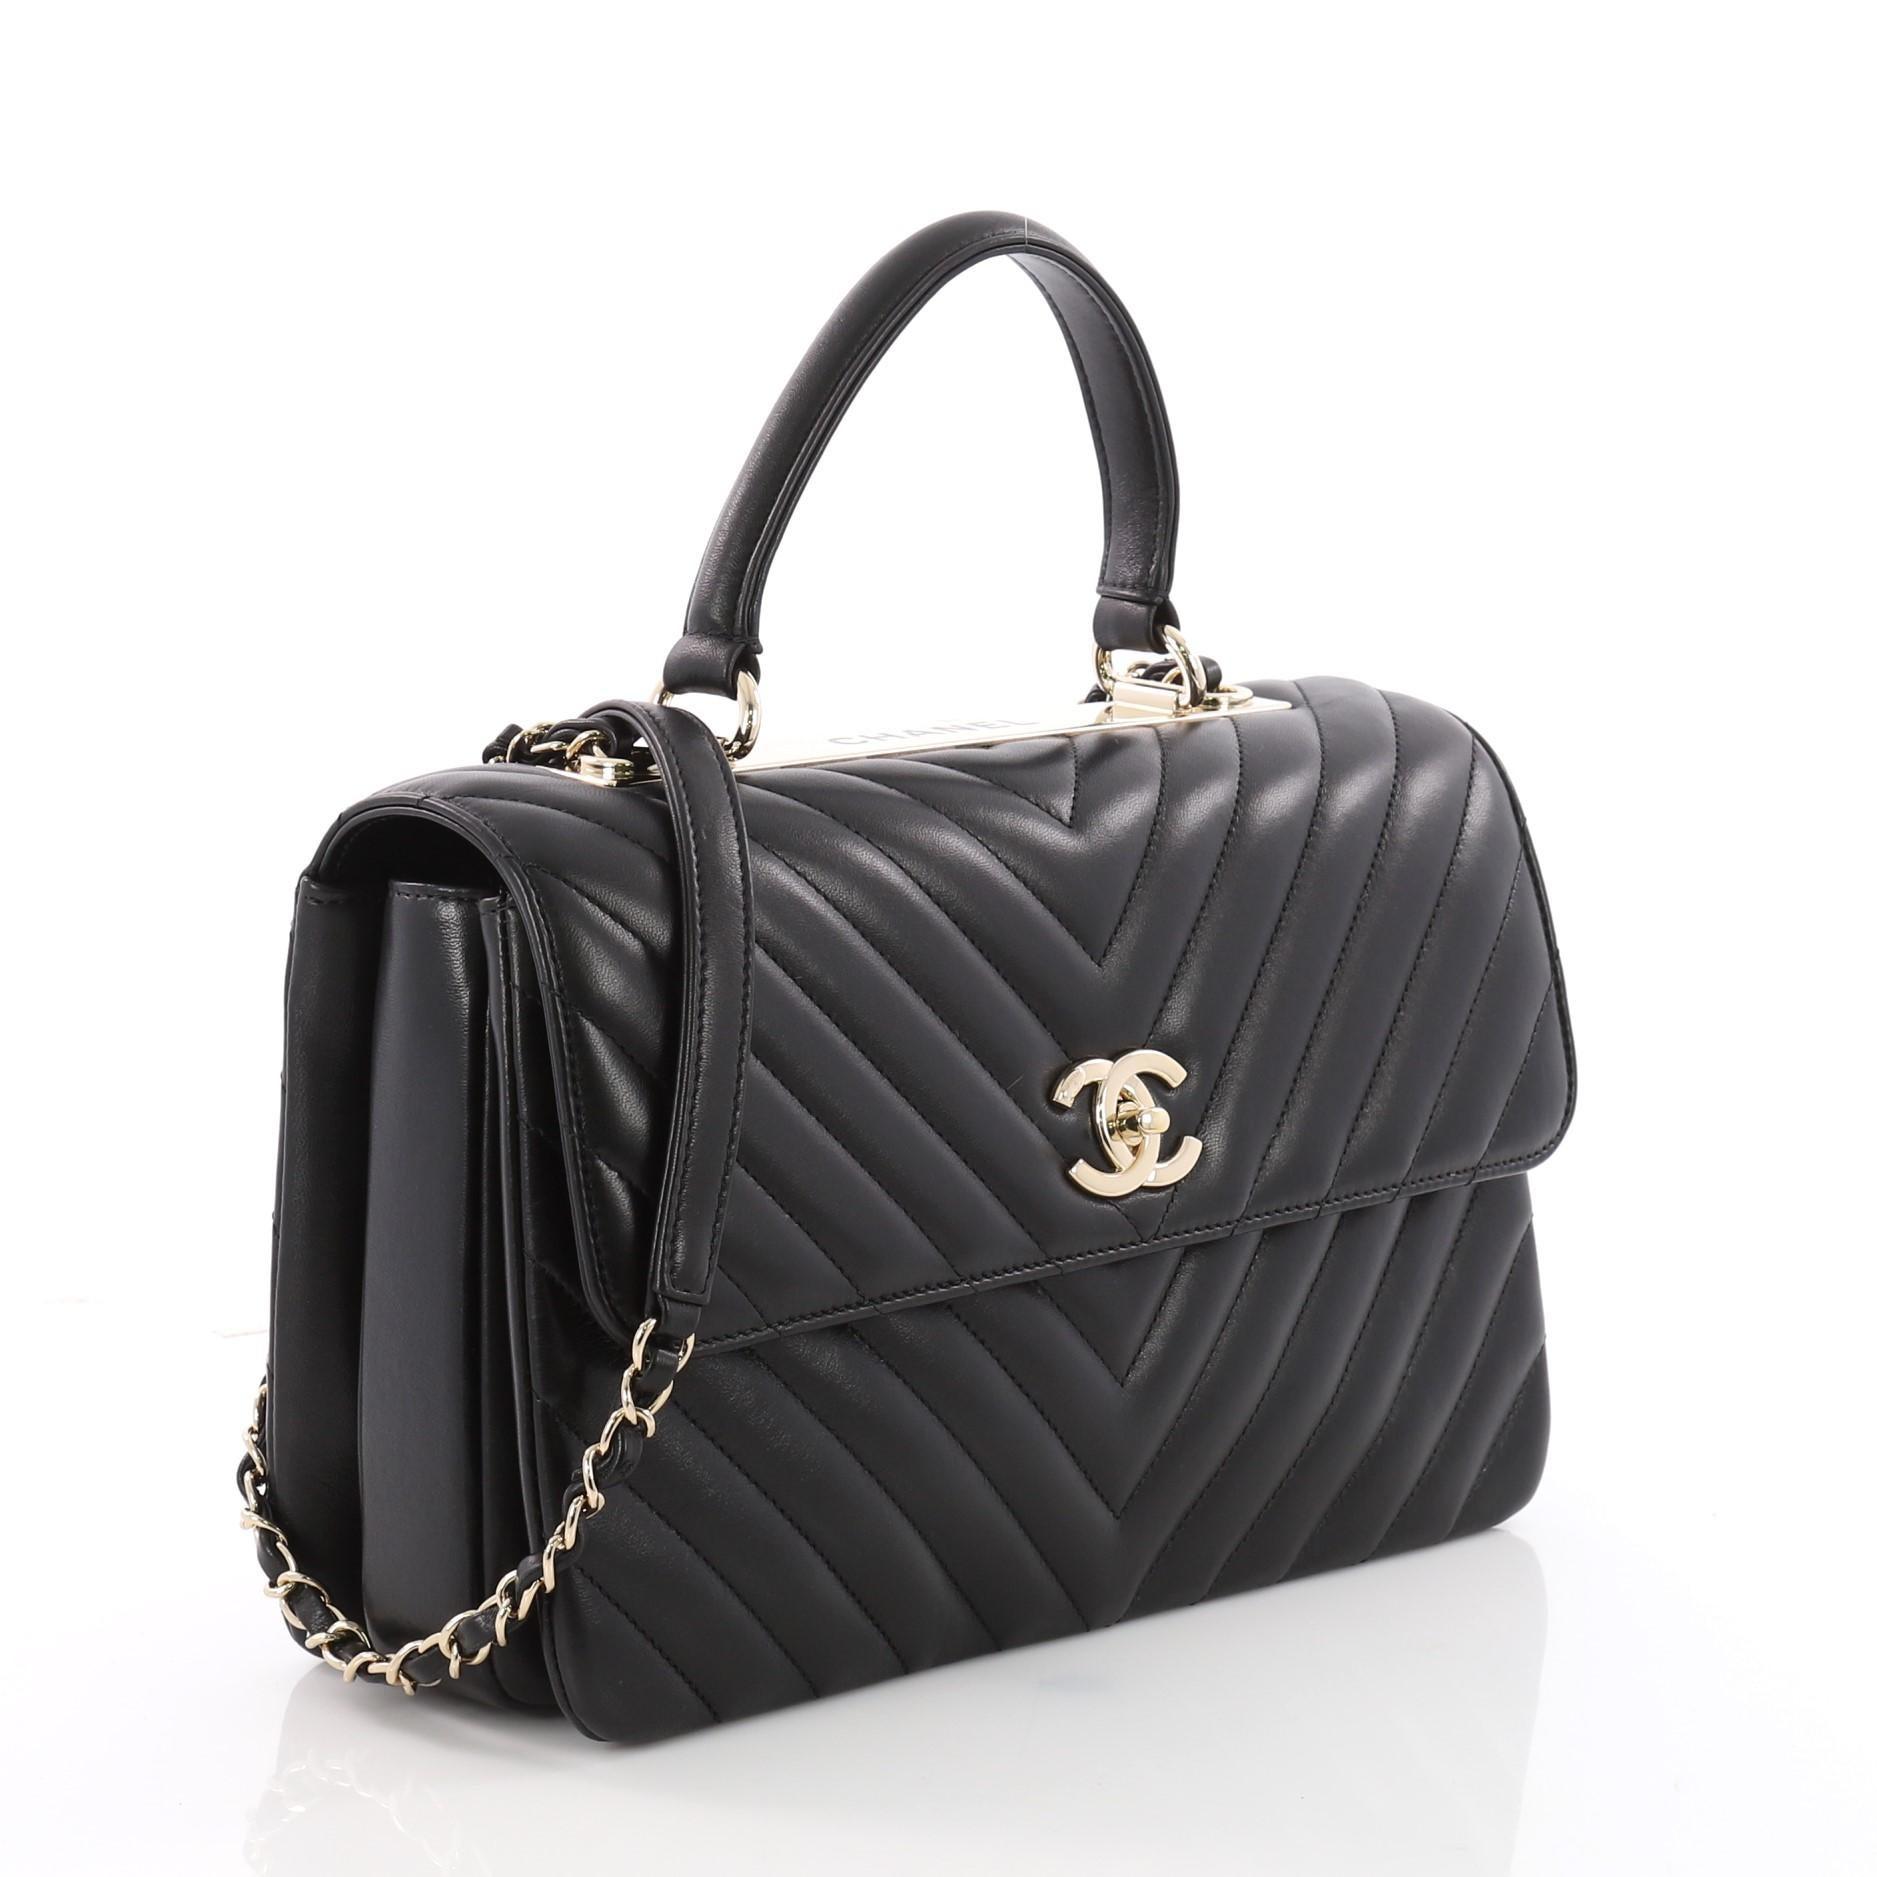 671aeeb8bd73b Chanel Trendy CC Top Handle Bag Chevron Lambskin Medium at 1stdibs